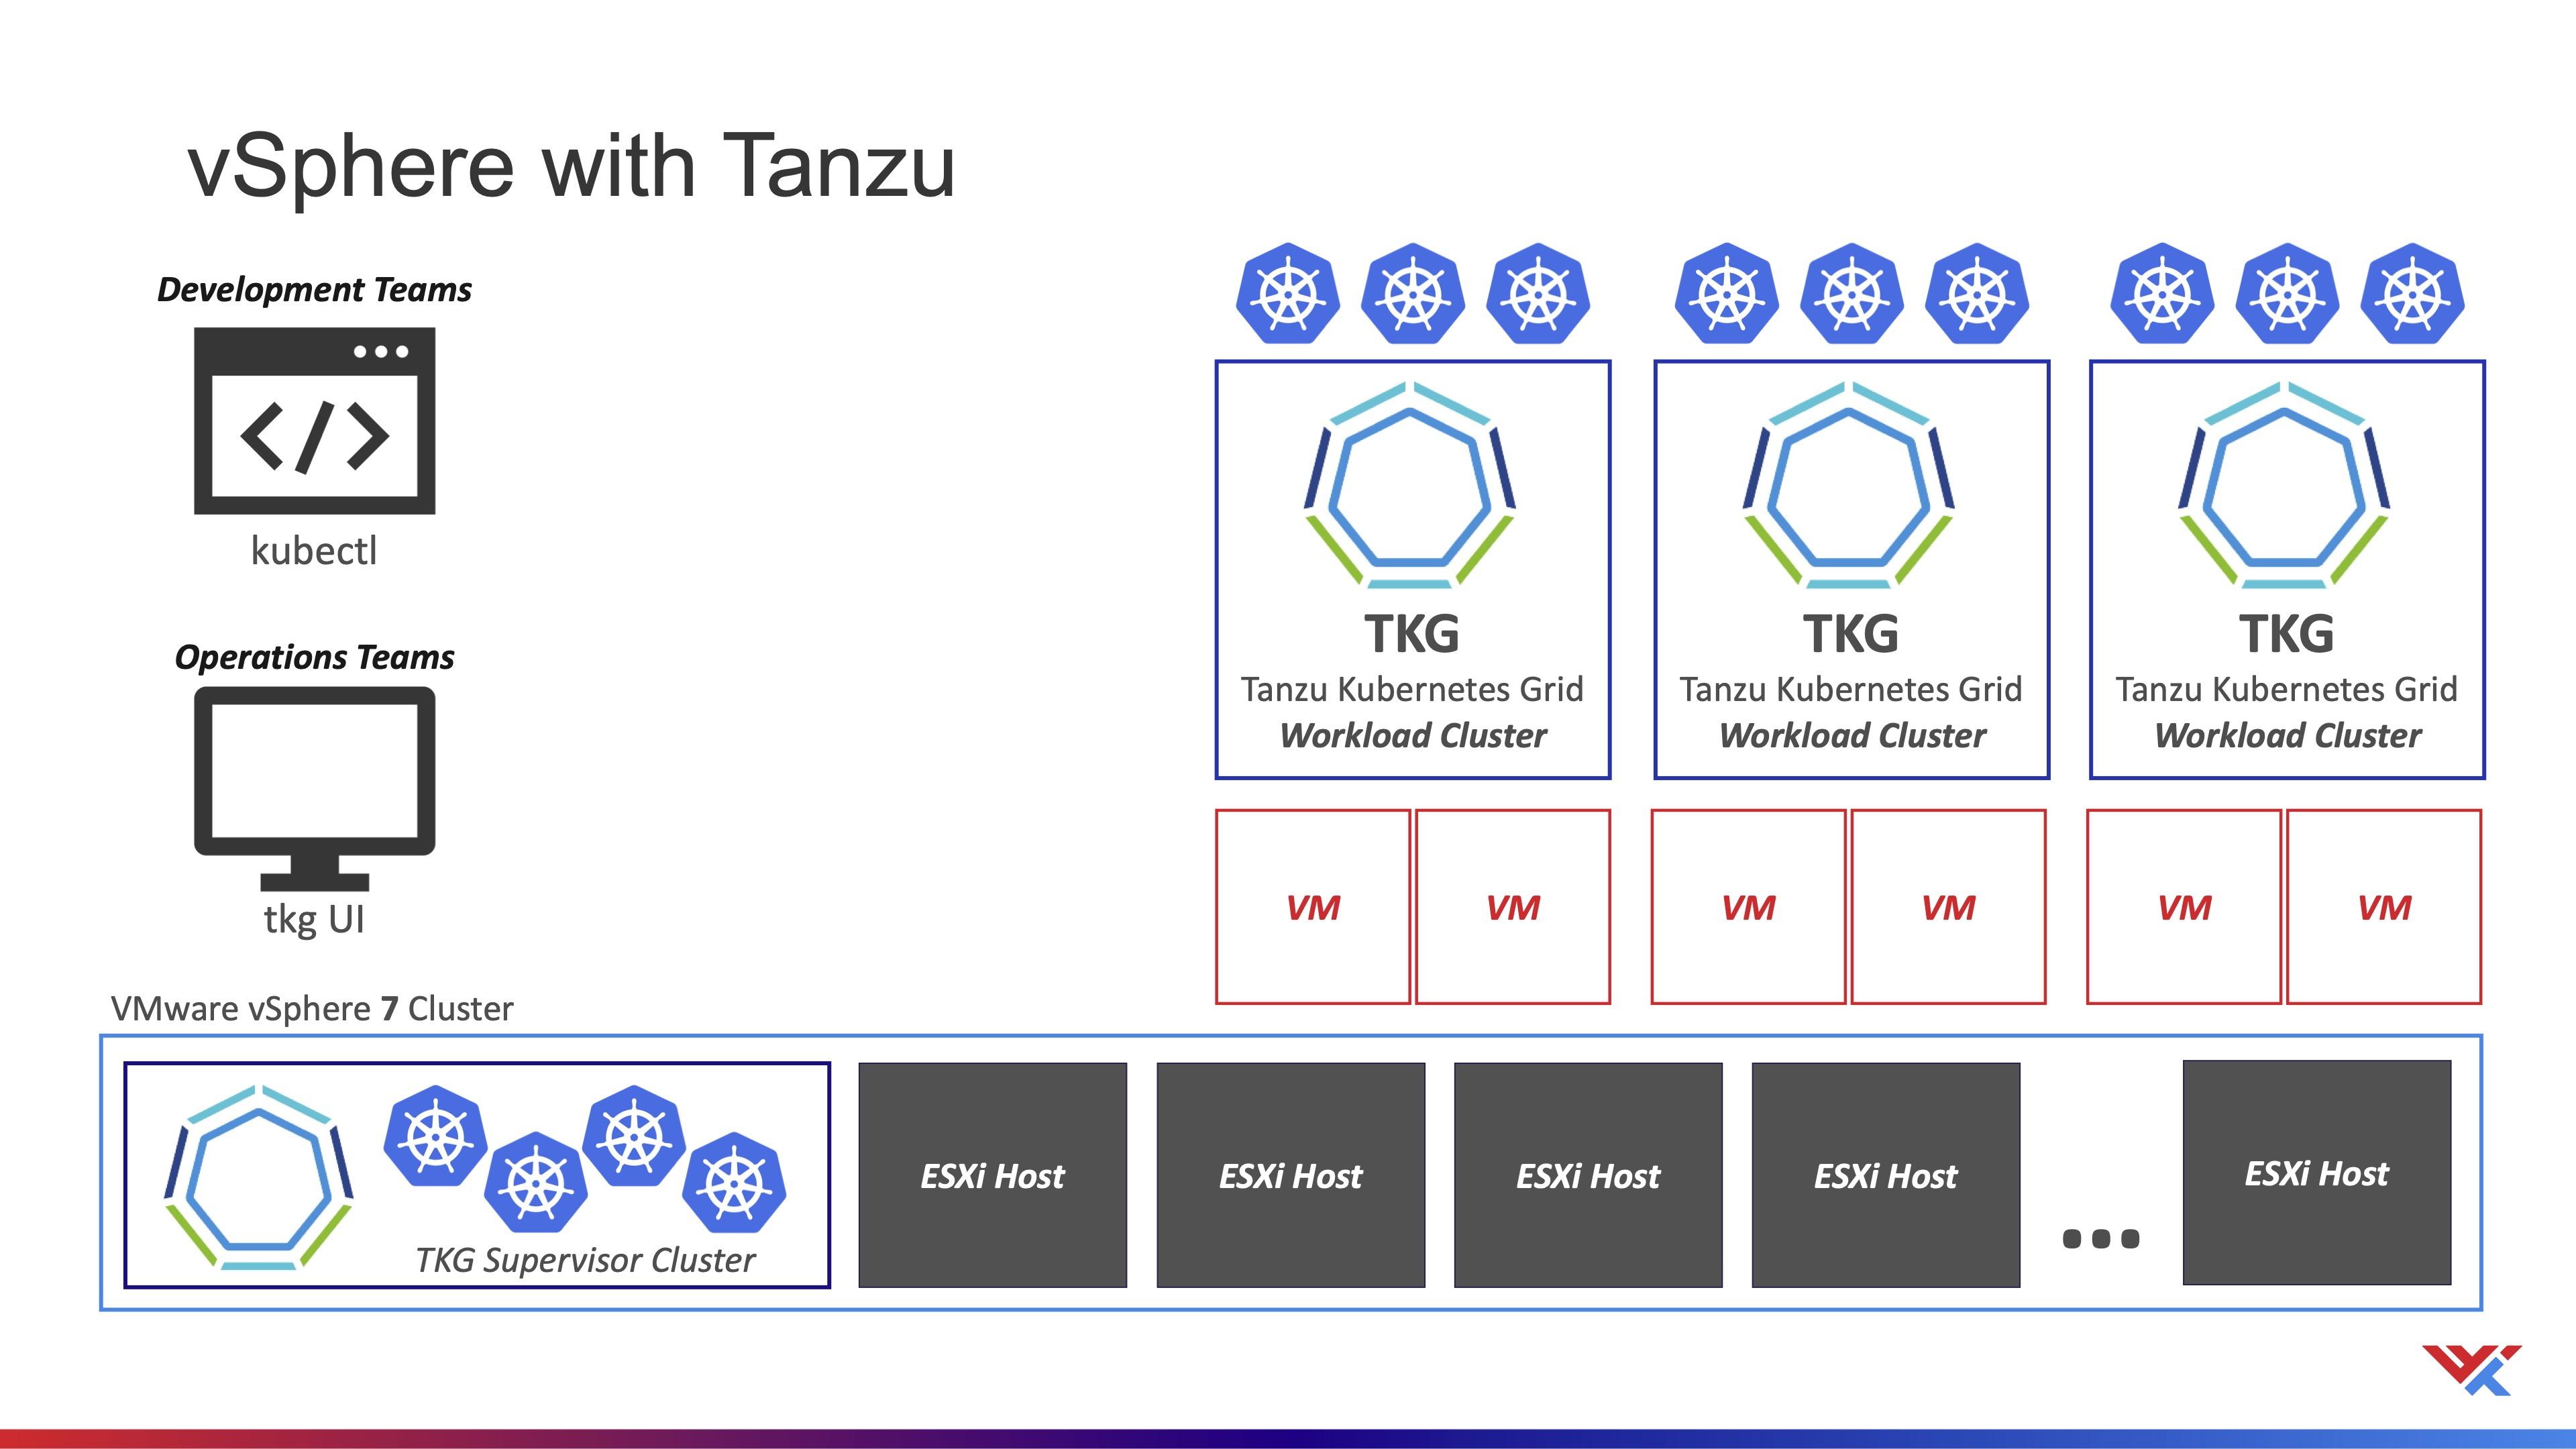 vSphere with Tanzu